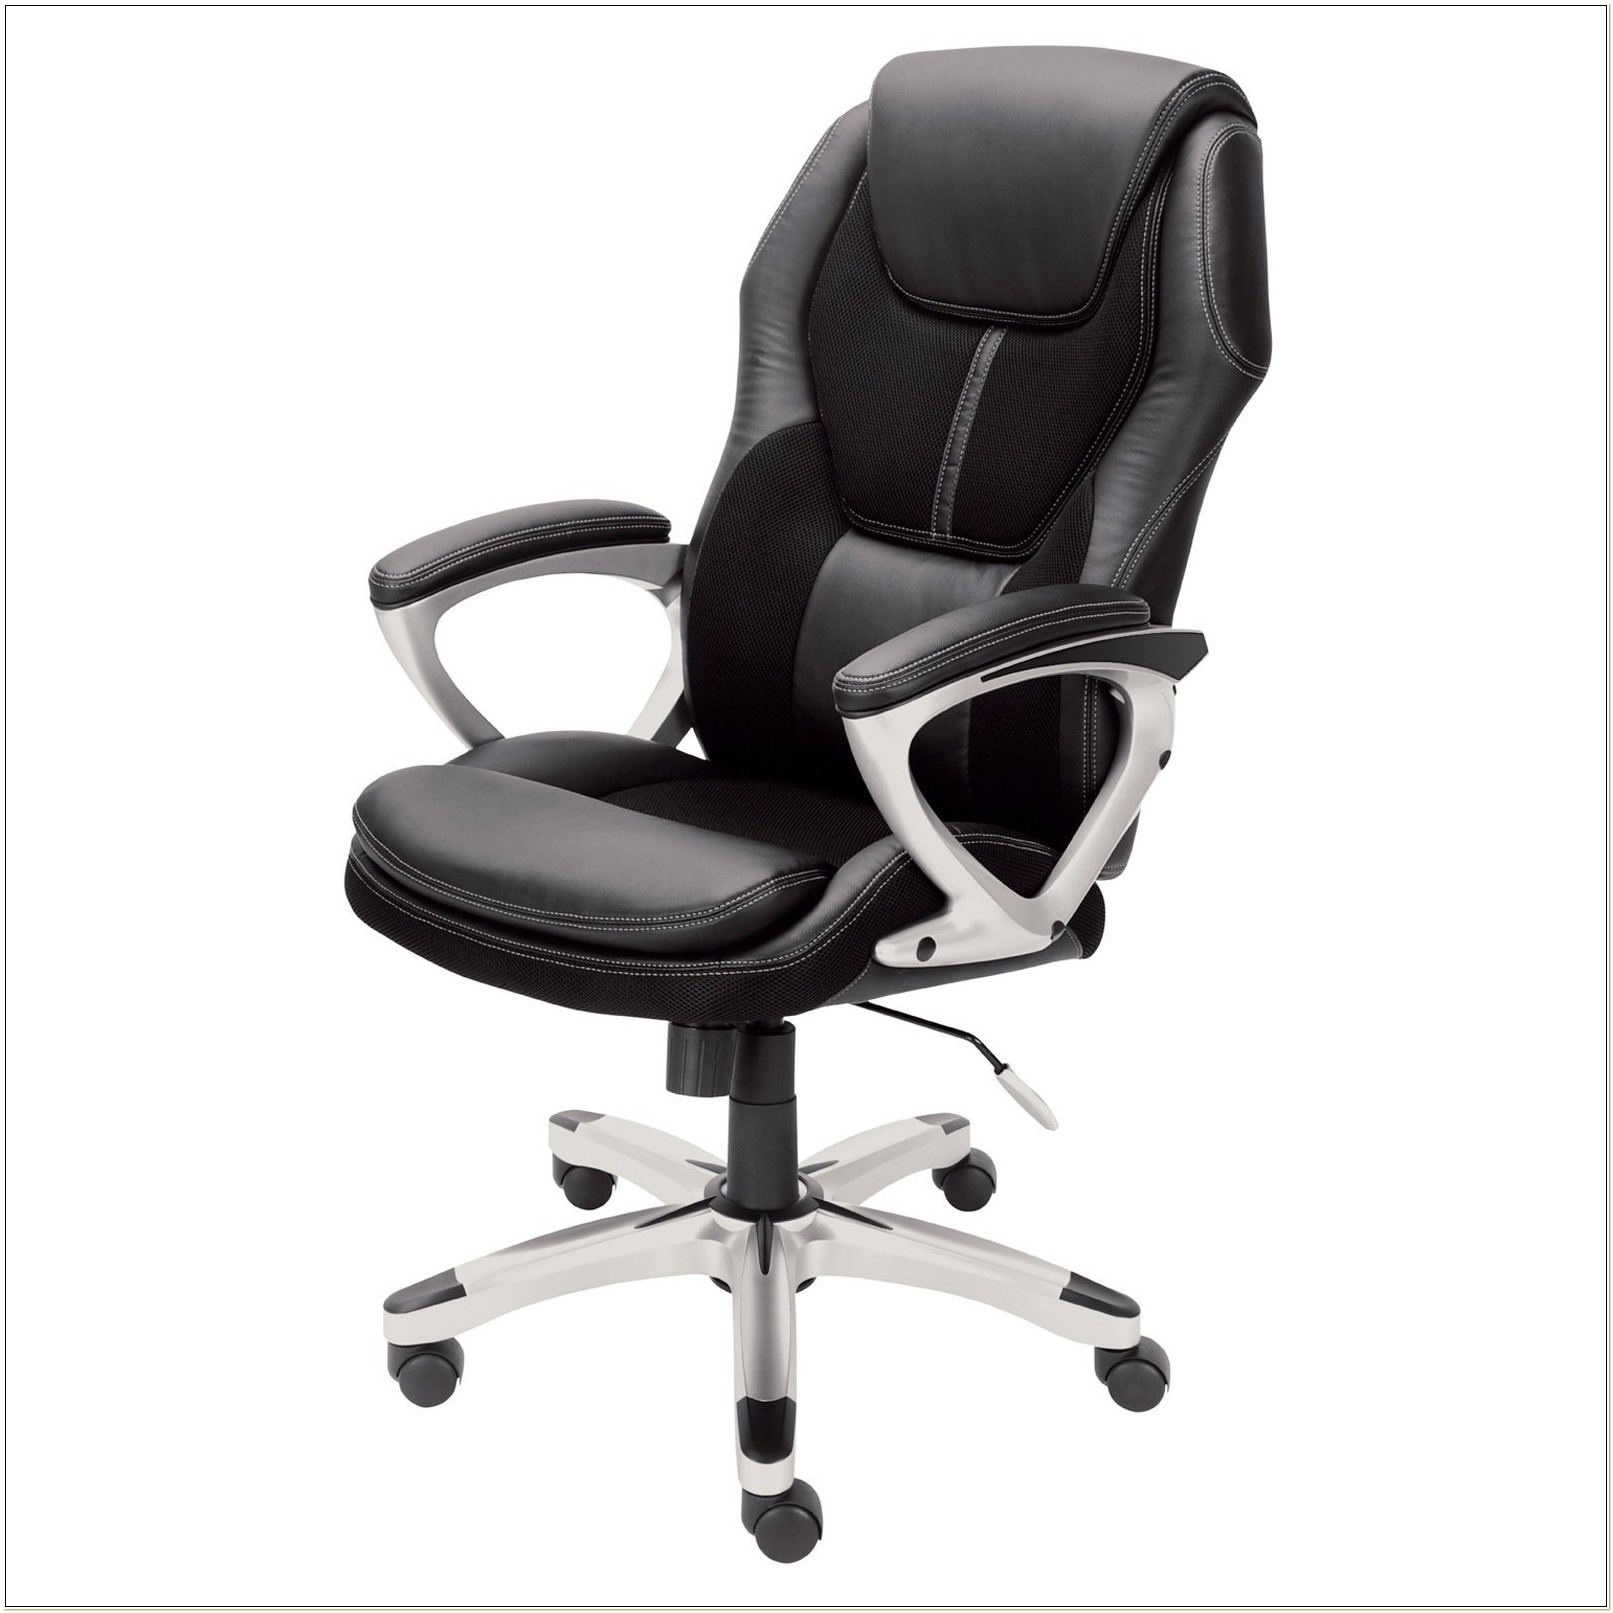 Serta Executive High Back Office Chair